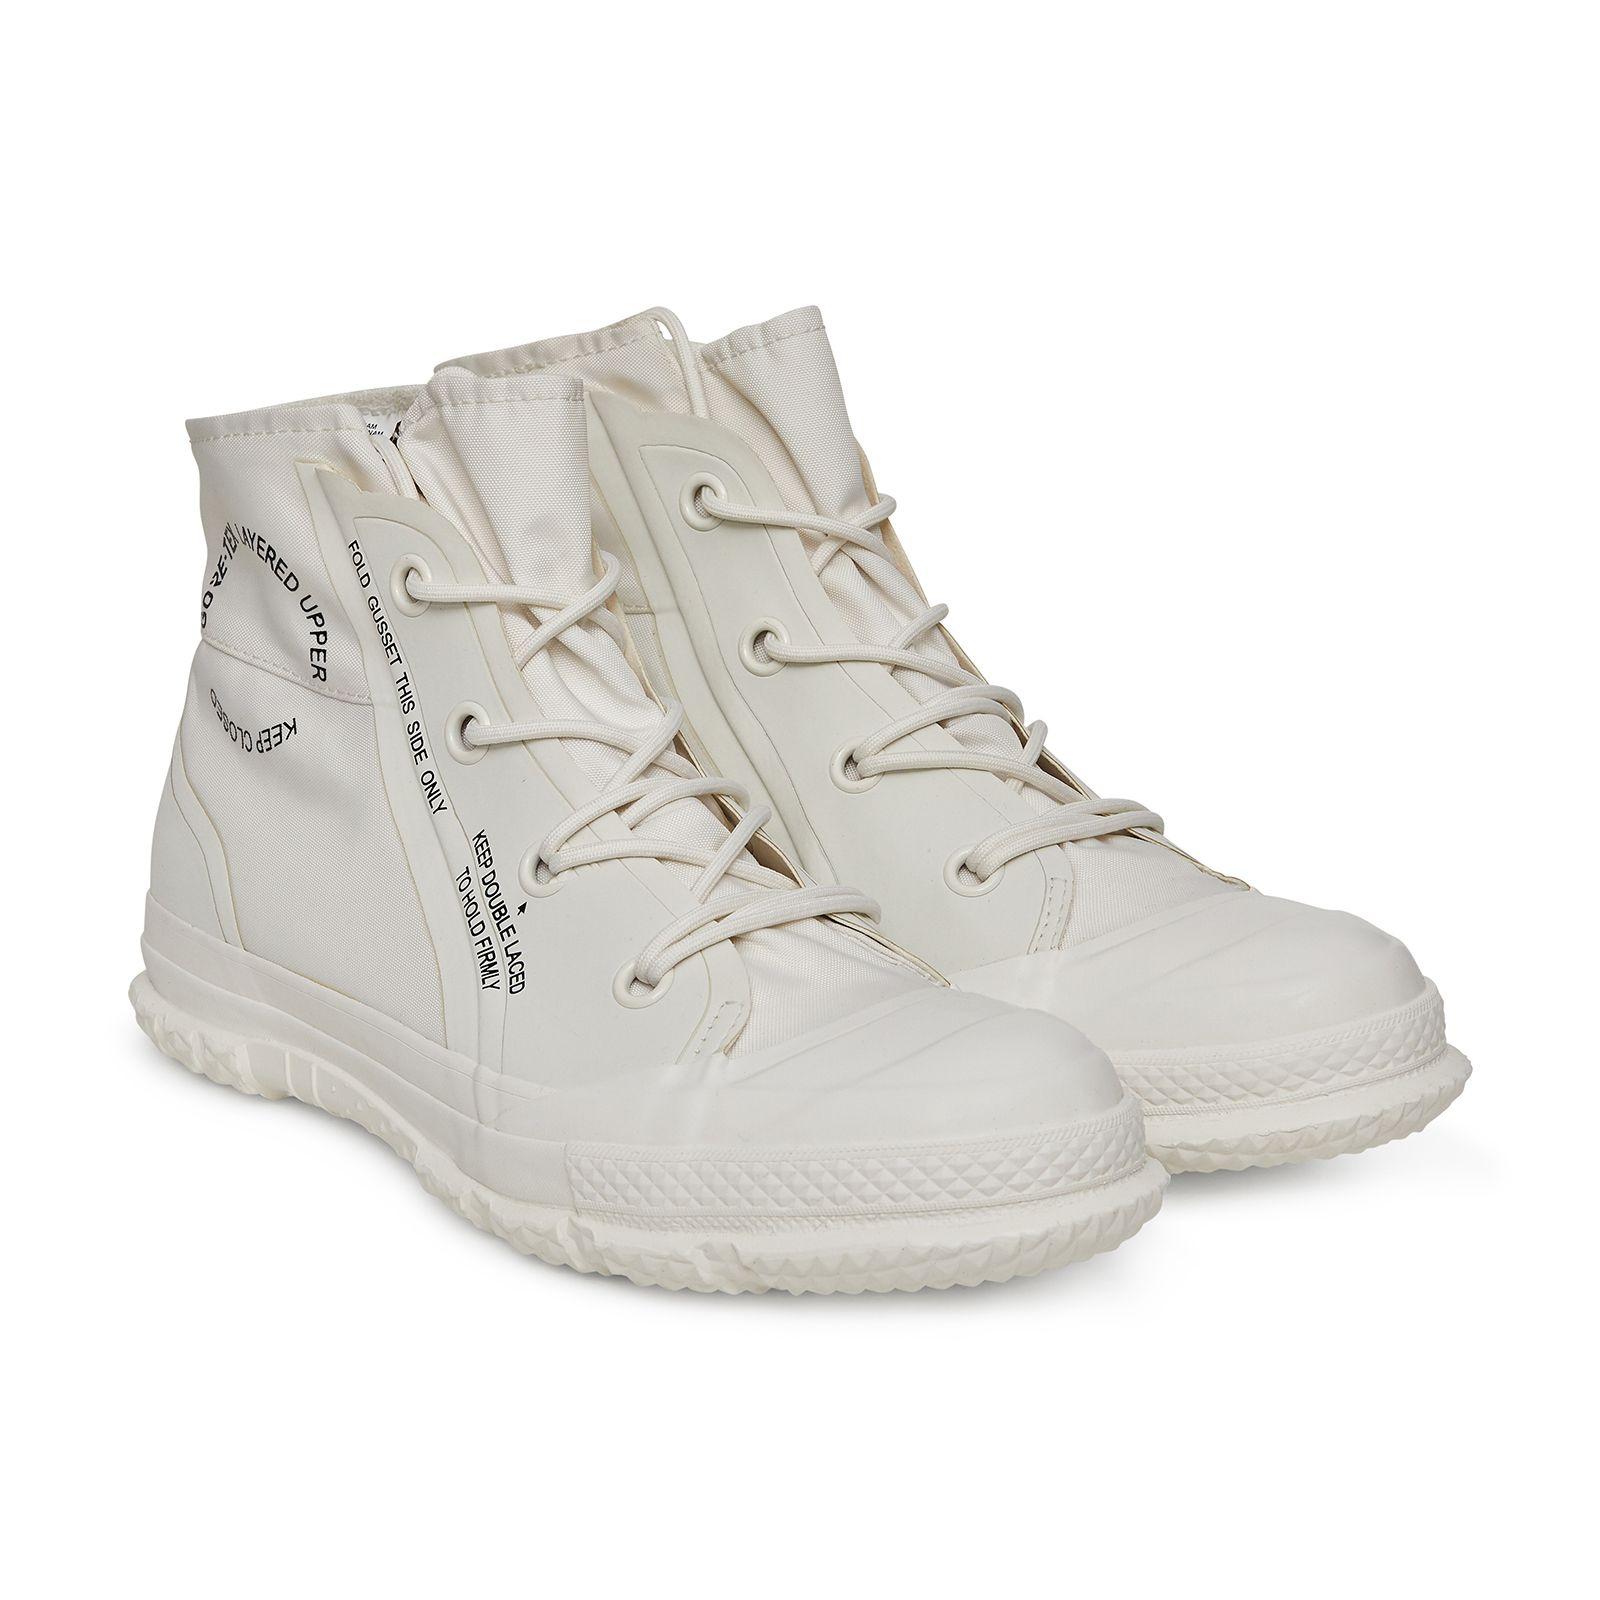 07b621439c8c GORE-TEX® Chuck Taylor  70 MC18 Sneakers